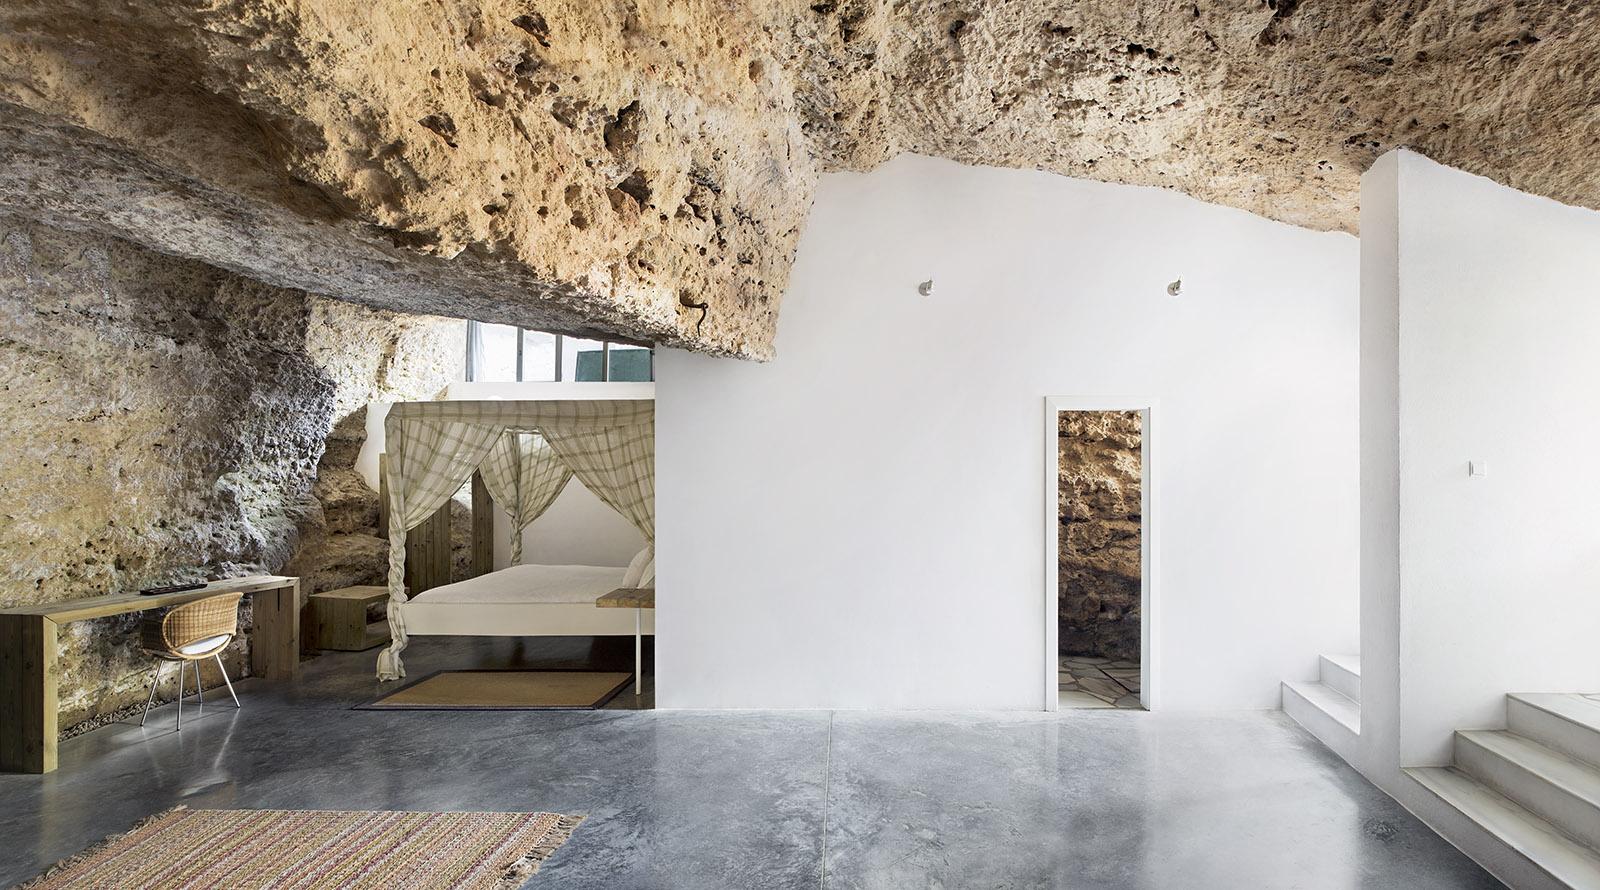 7. Cave House in Villarrubia Córdoba - Casa Tierra: a Cave House in Córdoba by UMMO Estudio